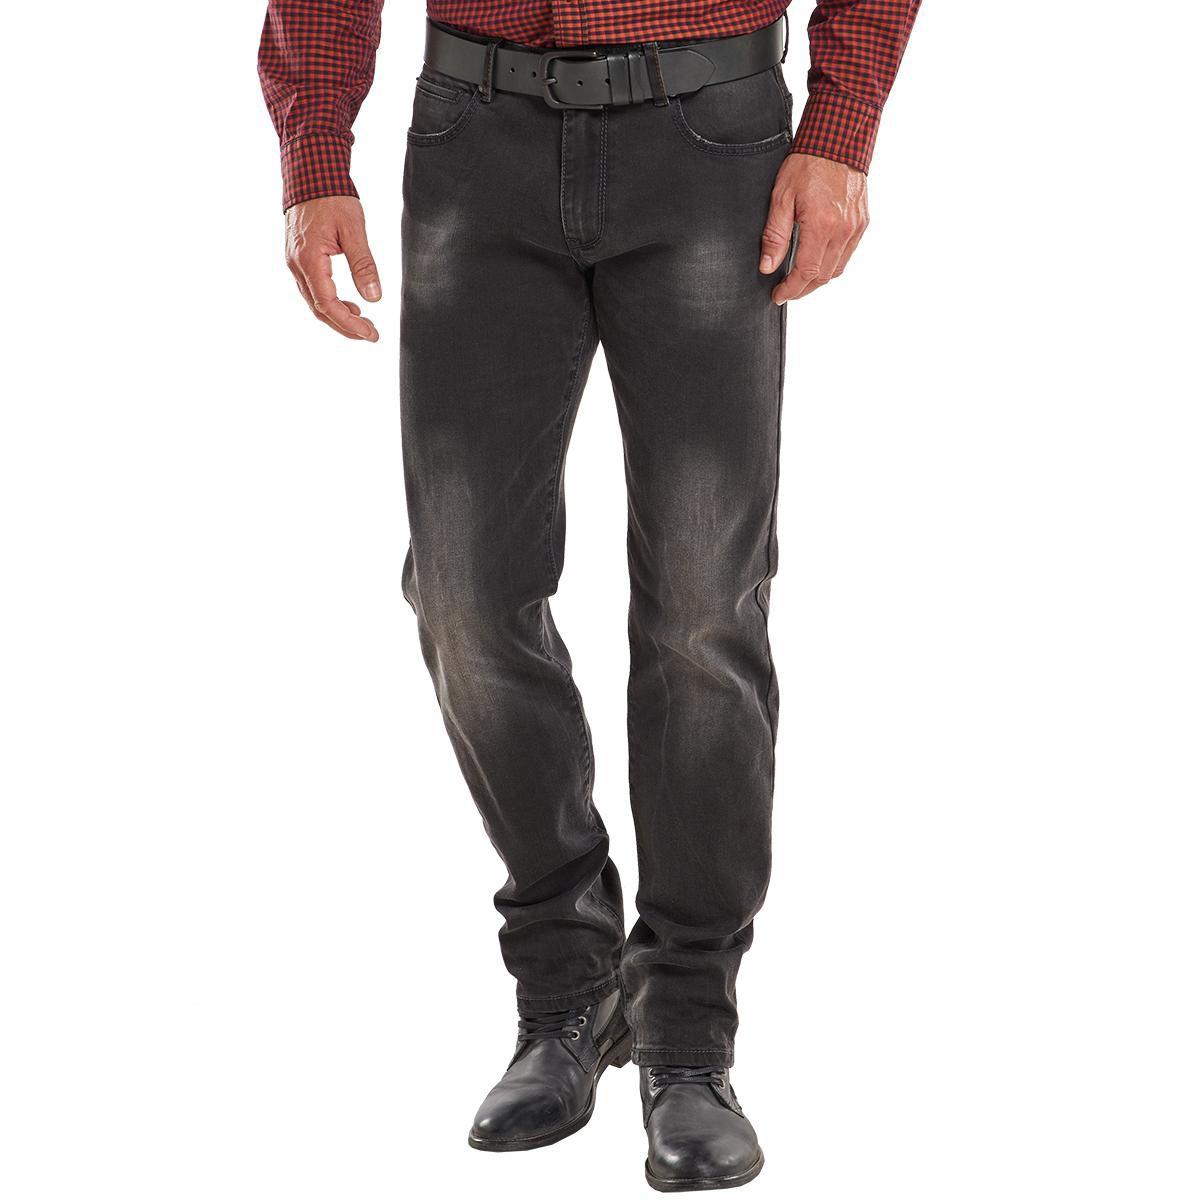 ENGBERS engbers Anthrazitfarbene Jeans